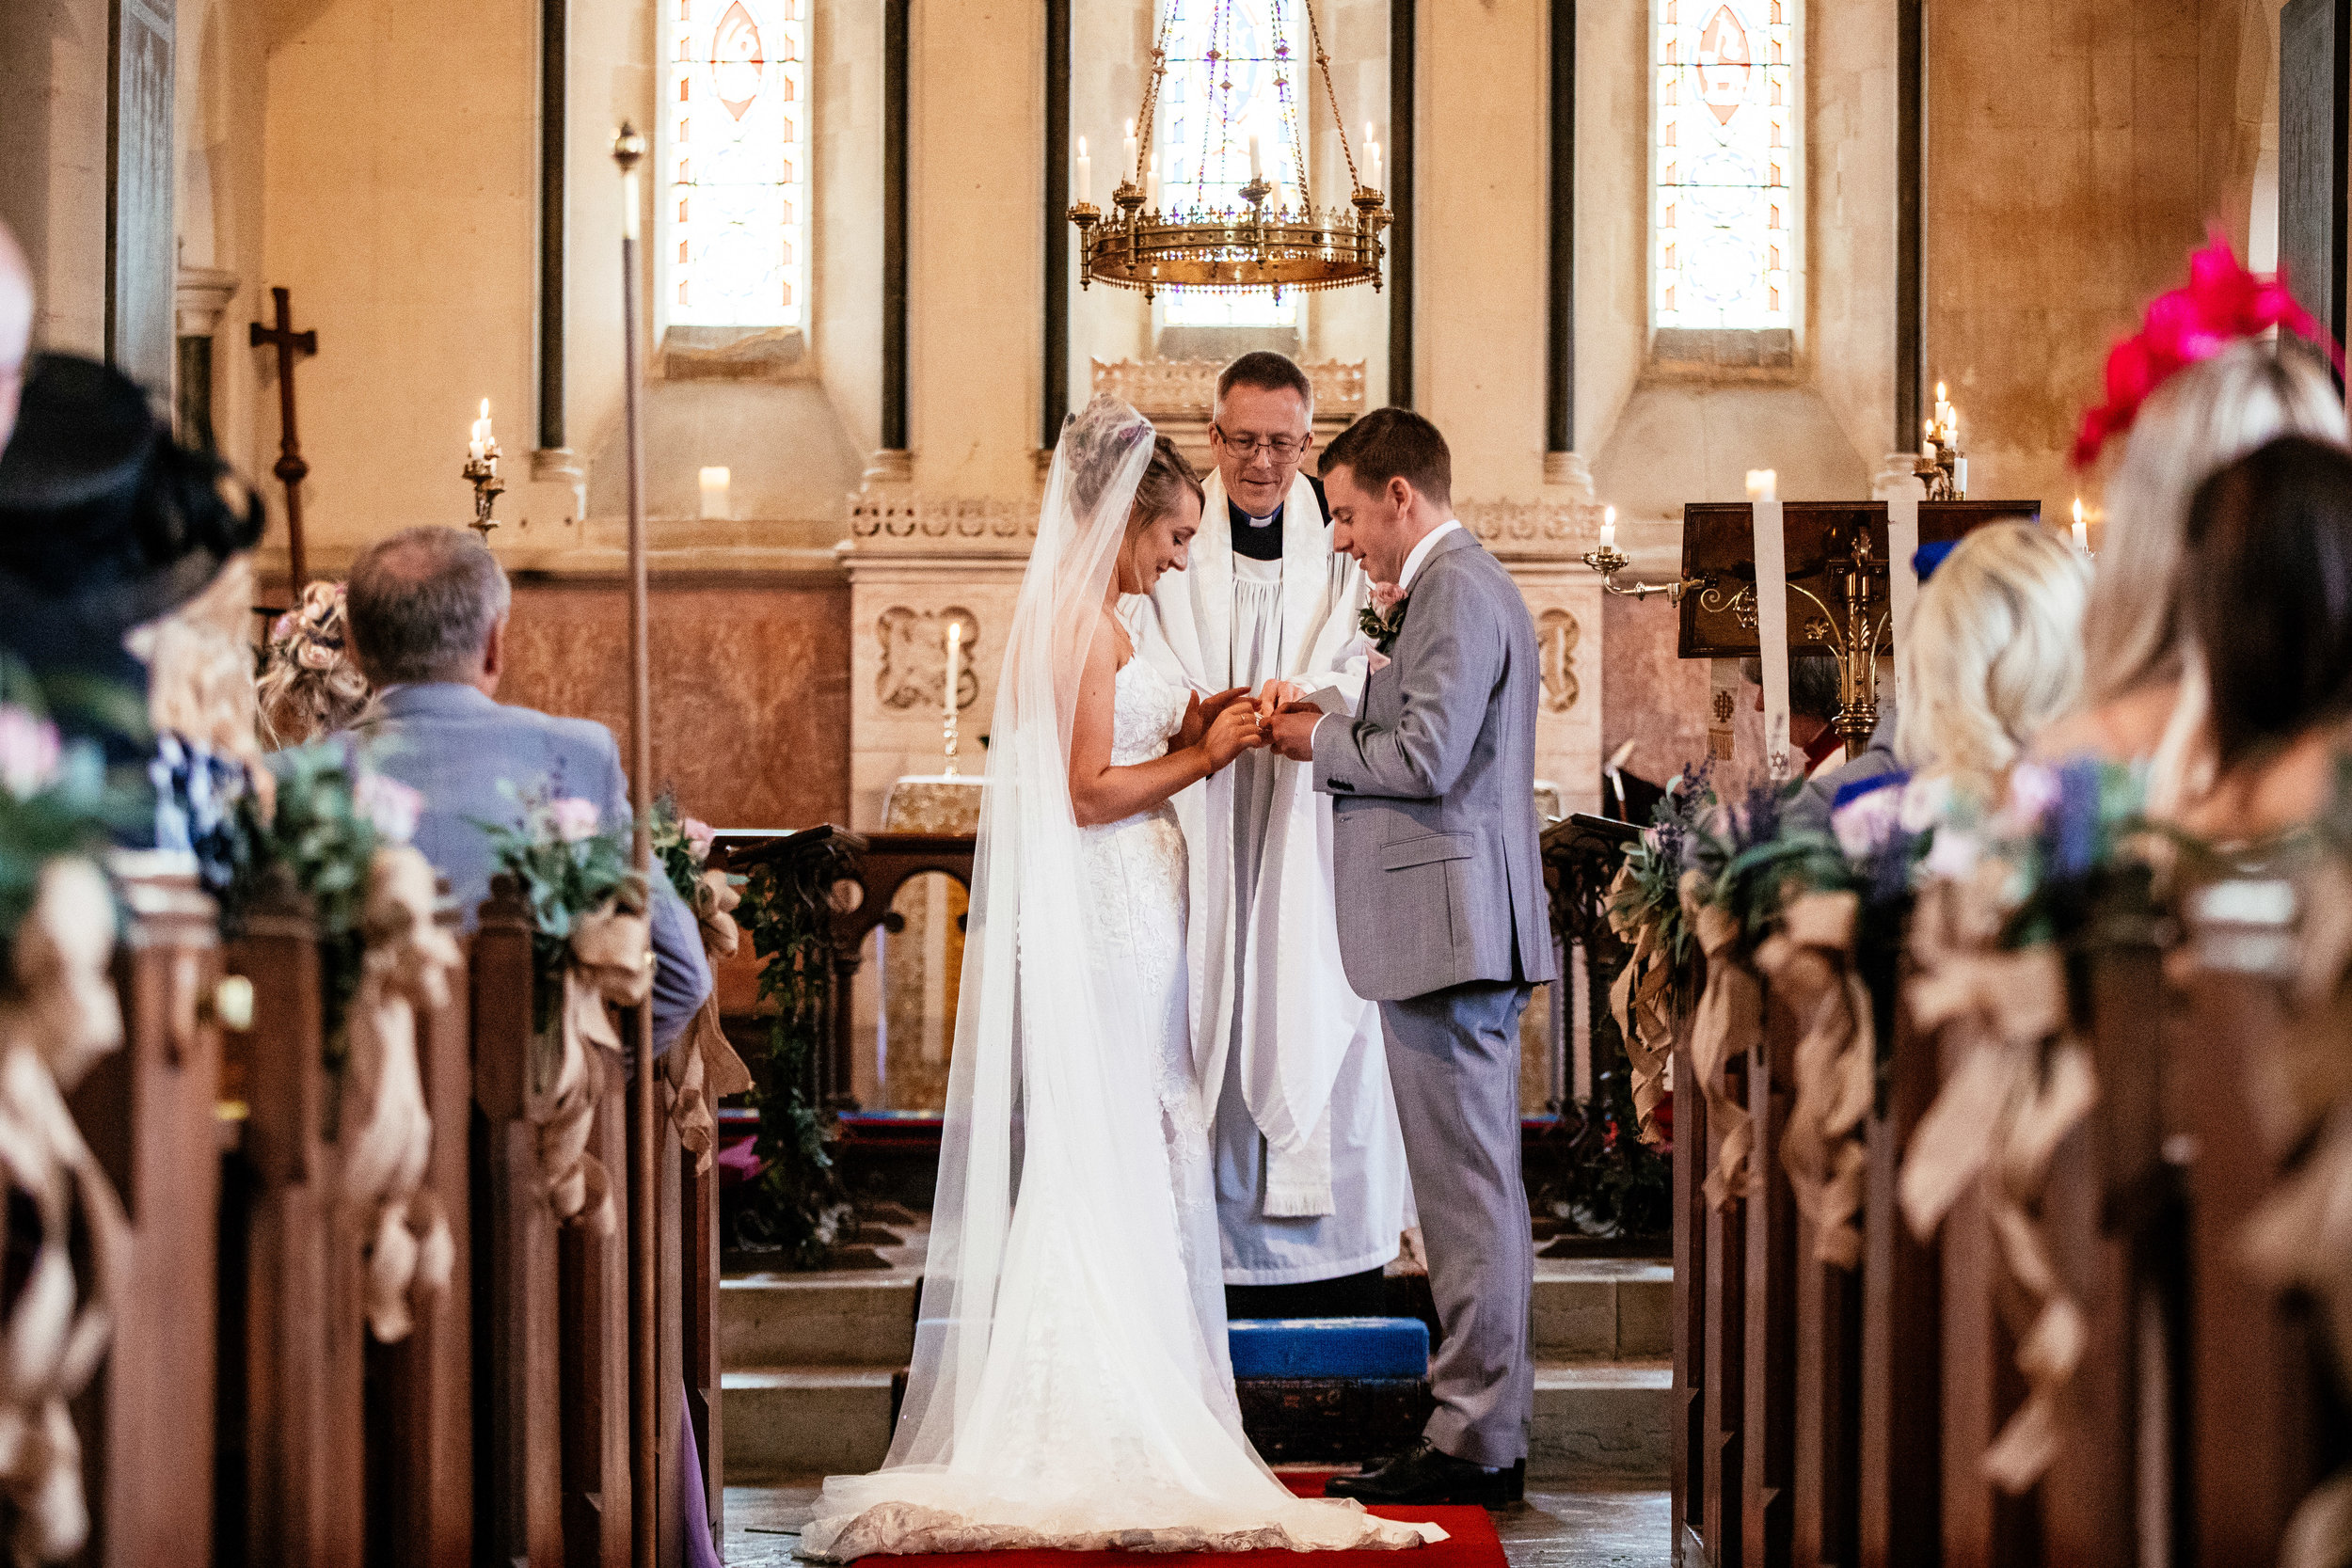 Becky-and-Sam-Wedding-Highlights-18.jpg